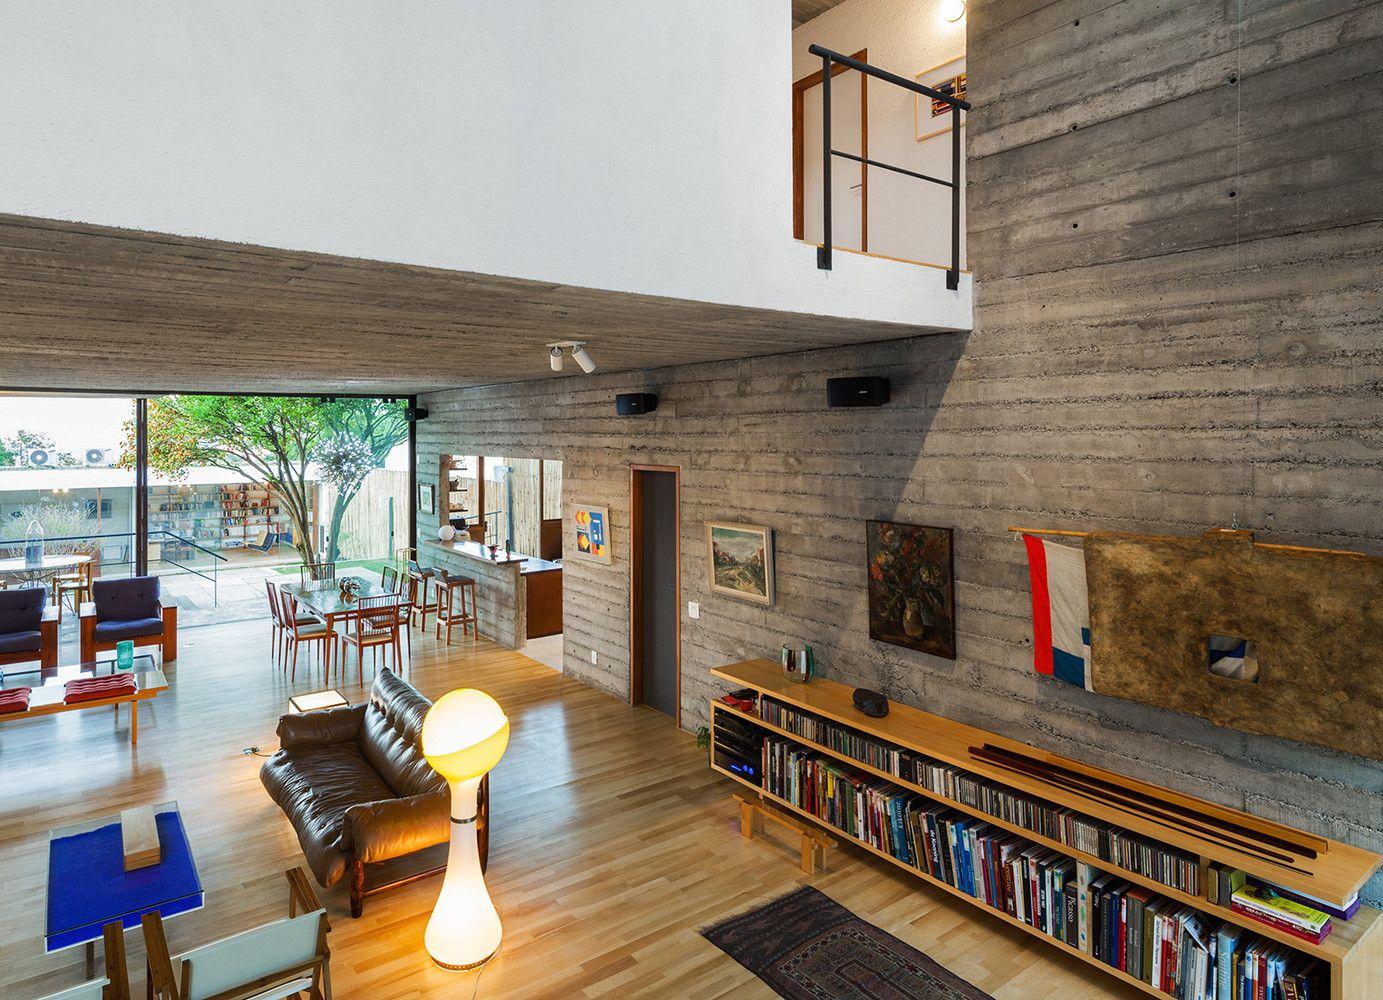 Pepiguari house nelson kon concrete houses concrete wall minimalist interior modern